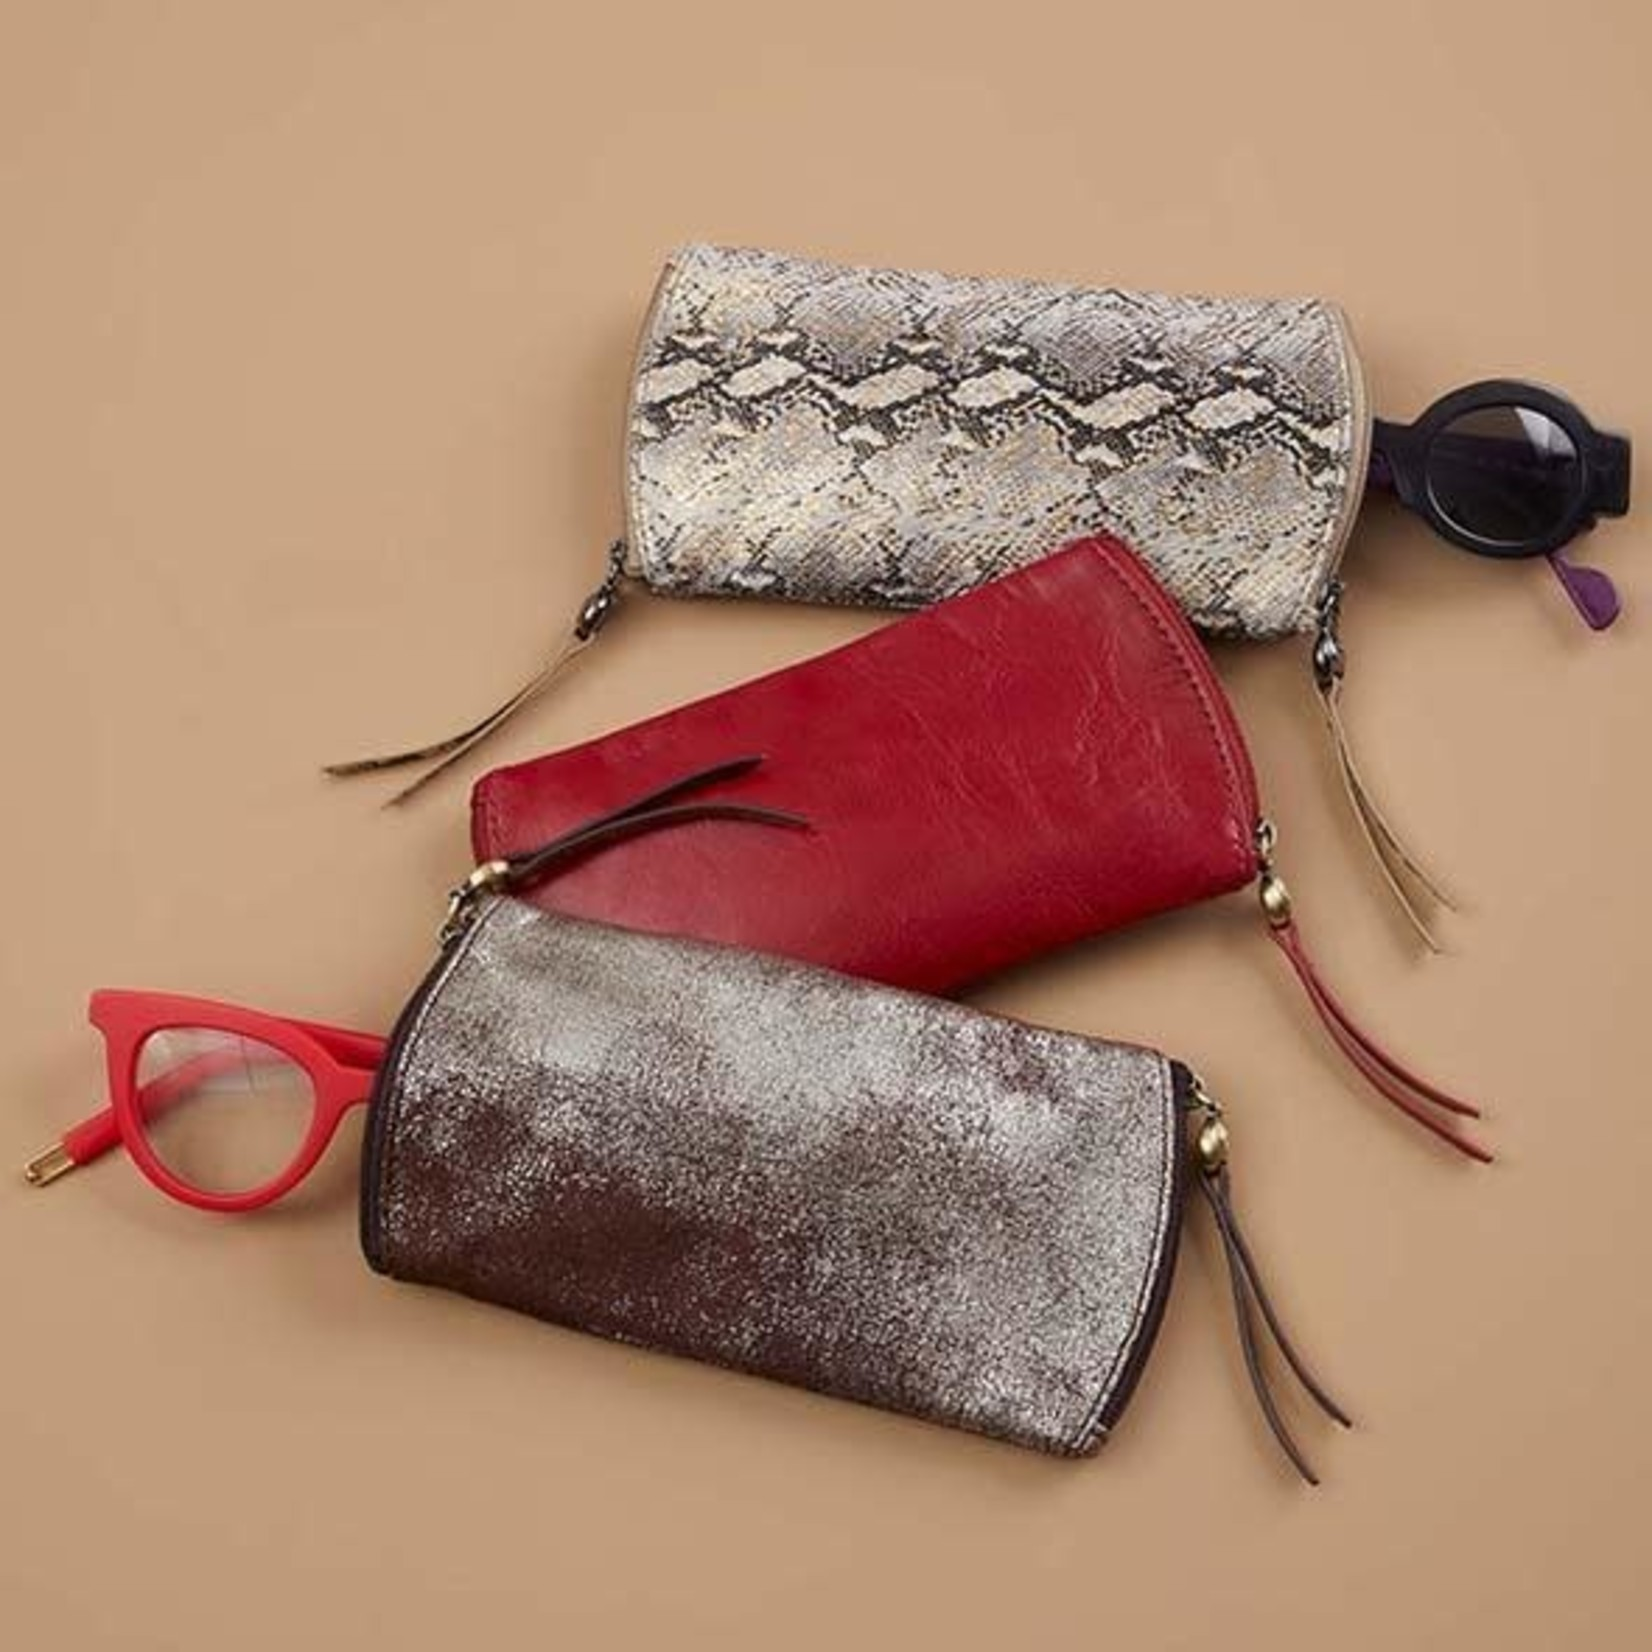 HOBO Spark Leather Glasses Case